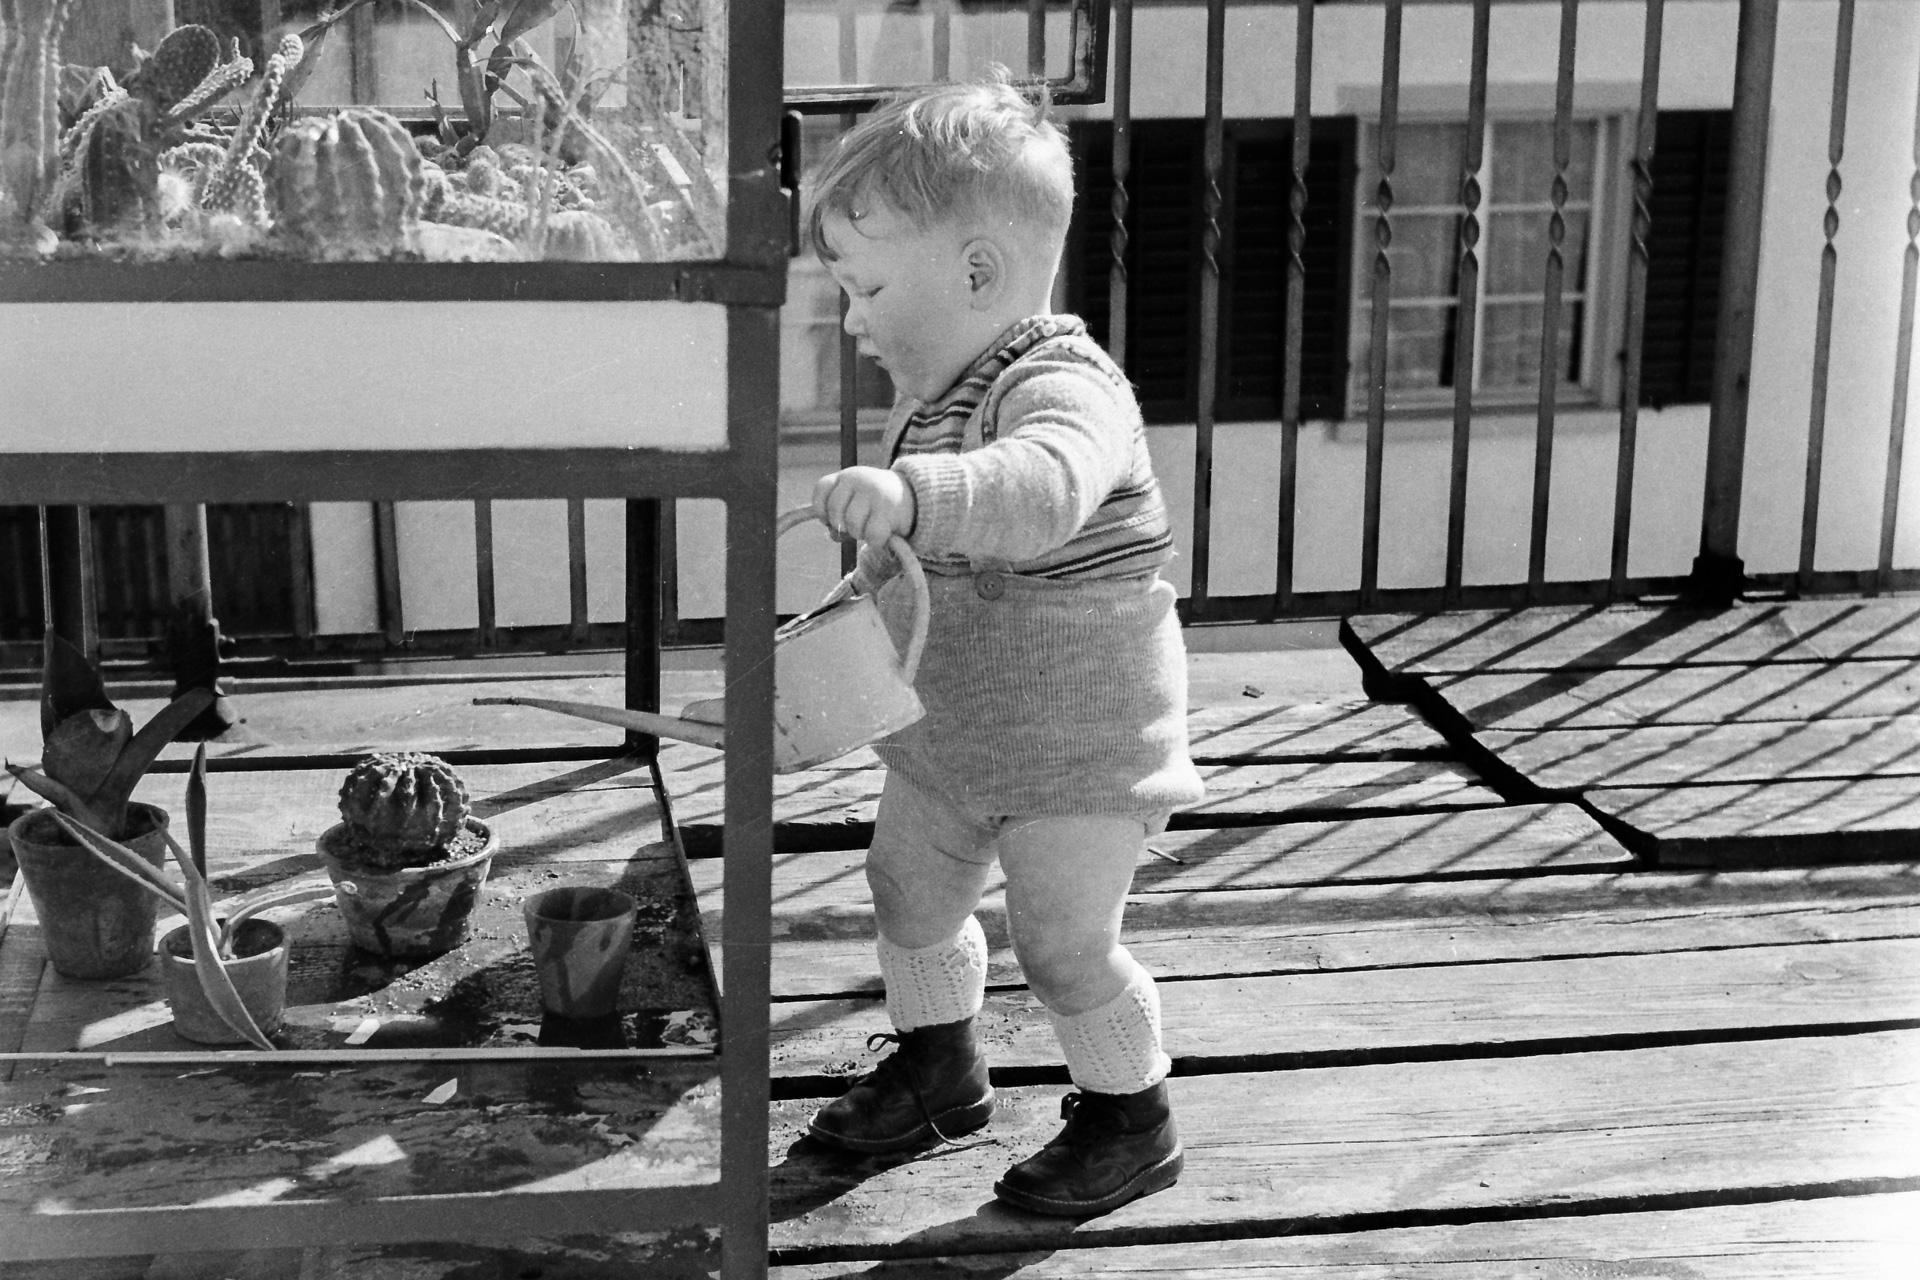 ca. 1950